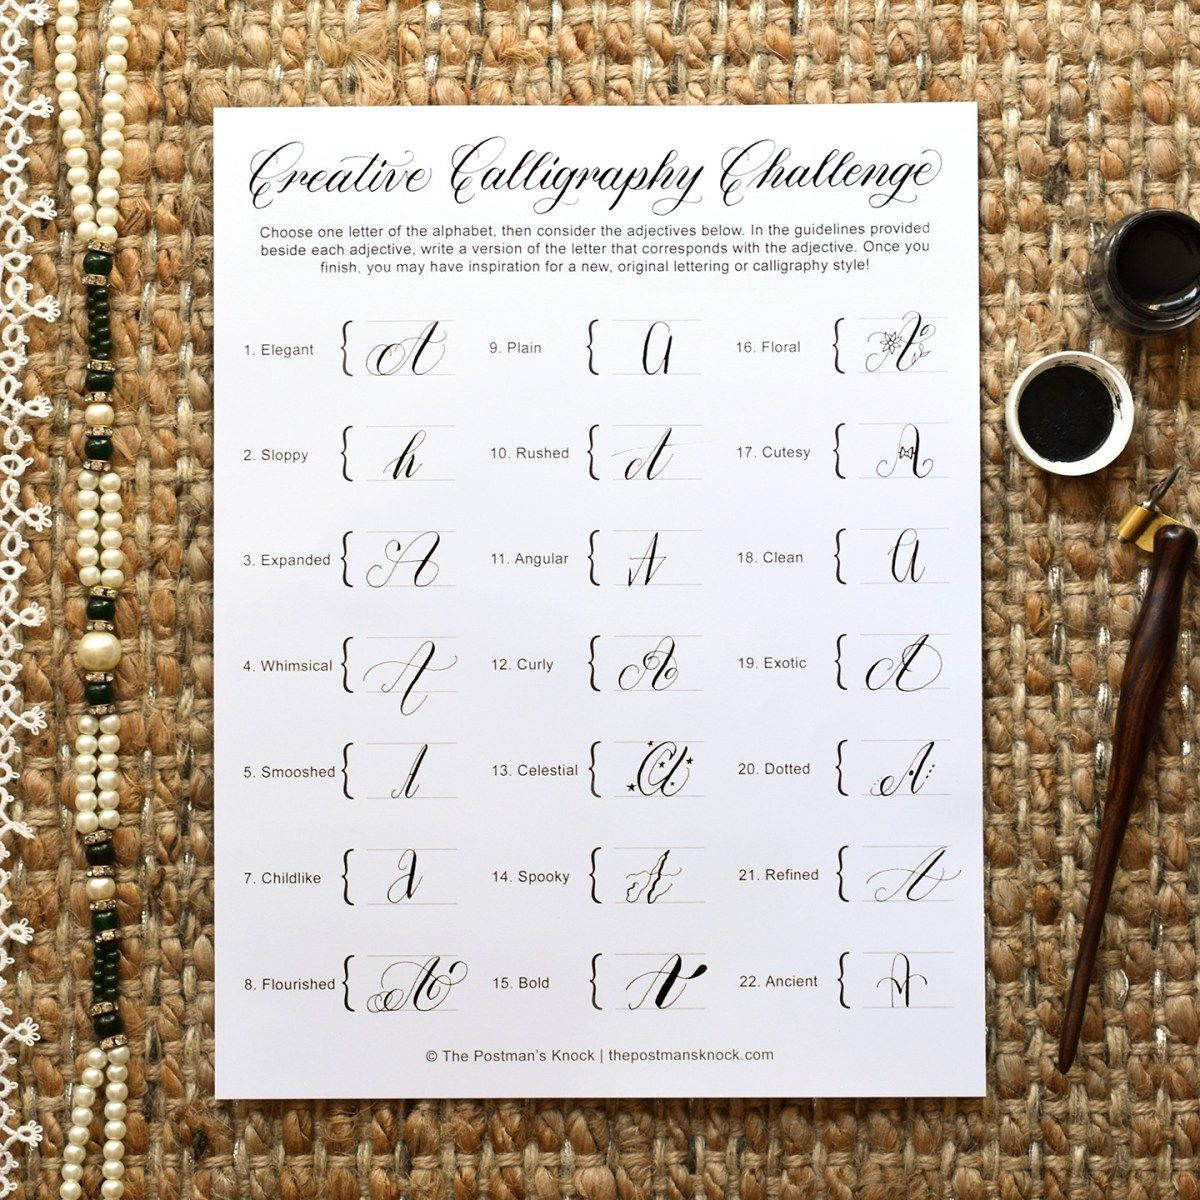 A Creative Calligraphy Challenge Calligraphy